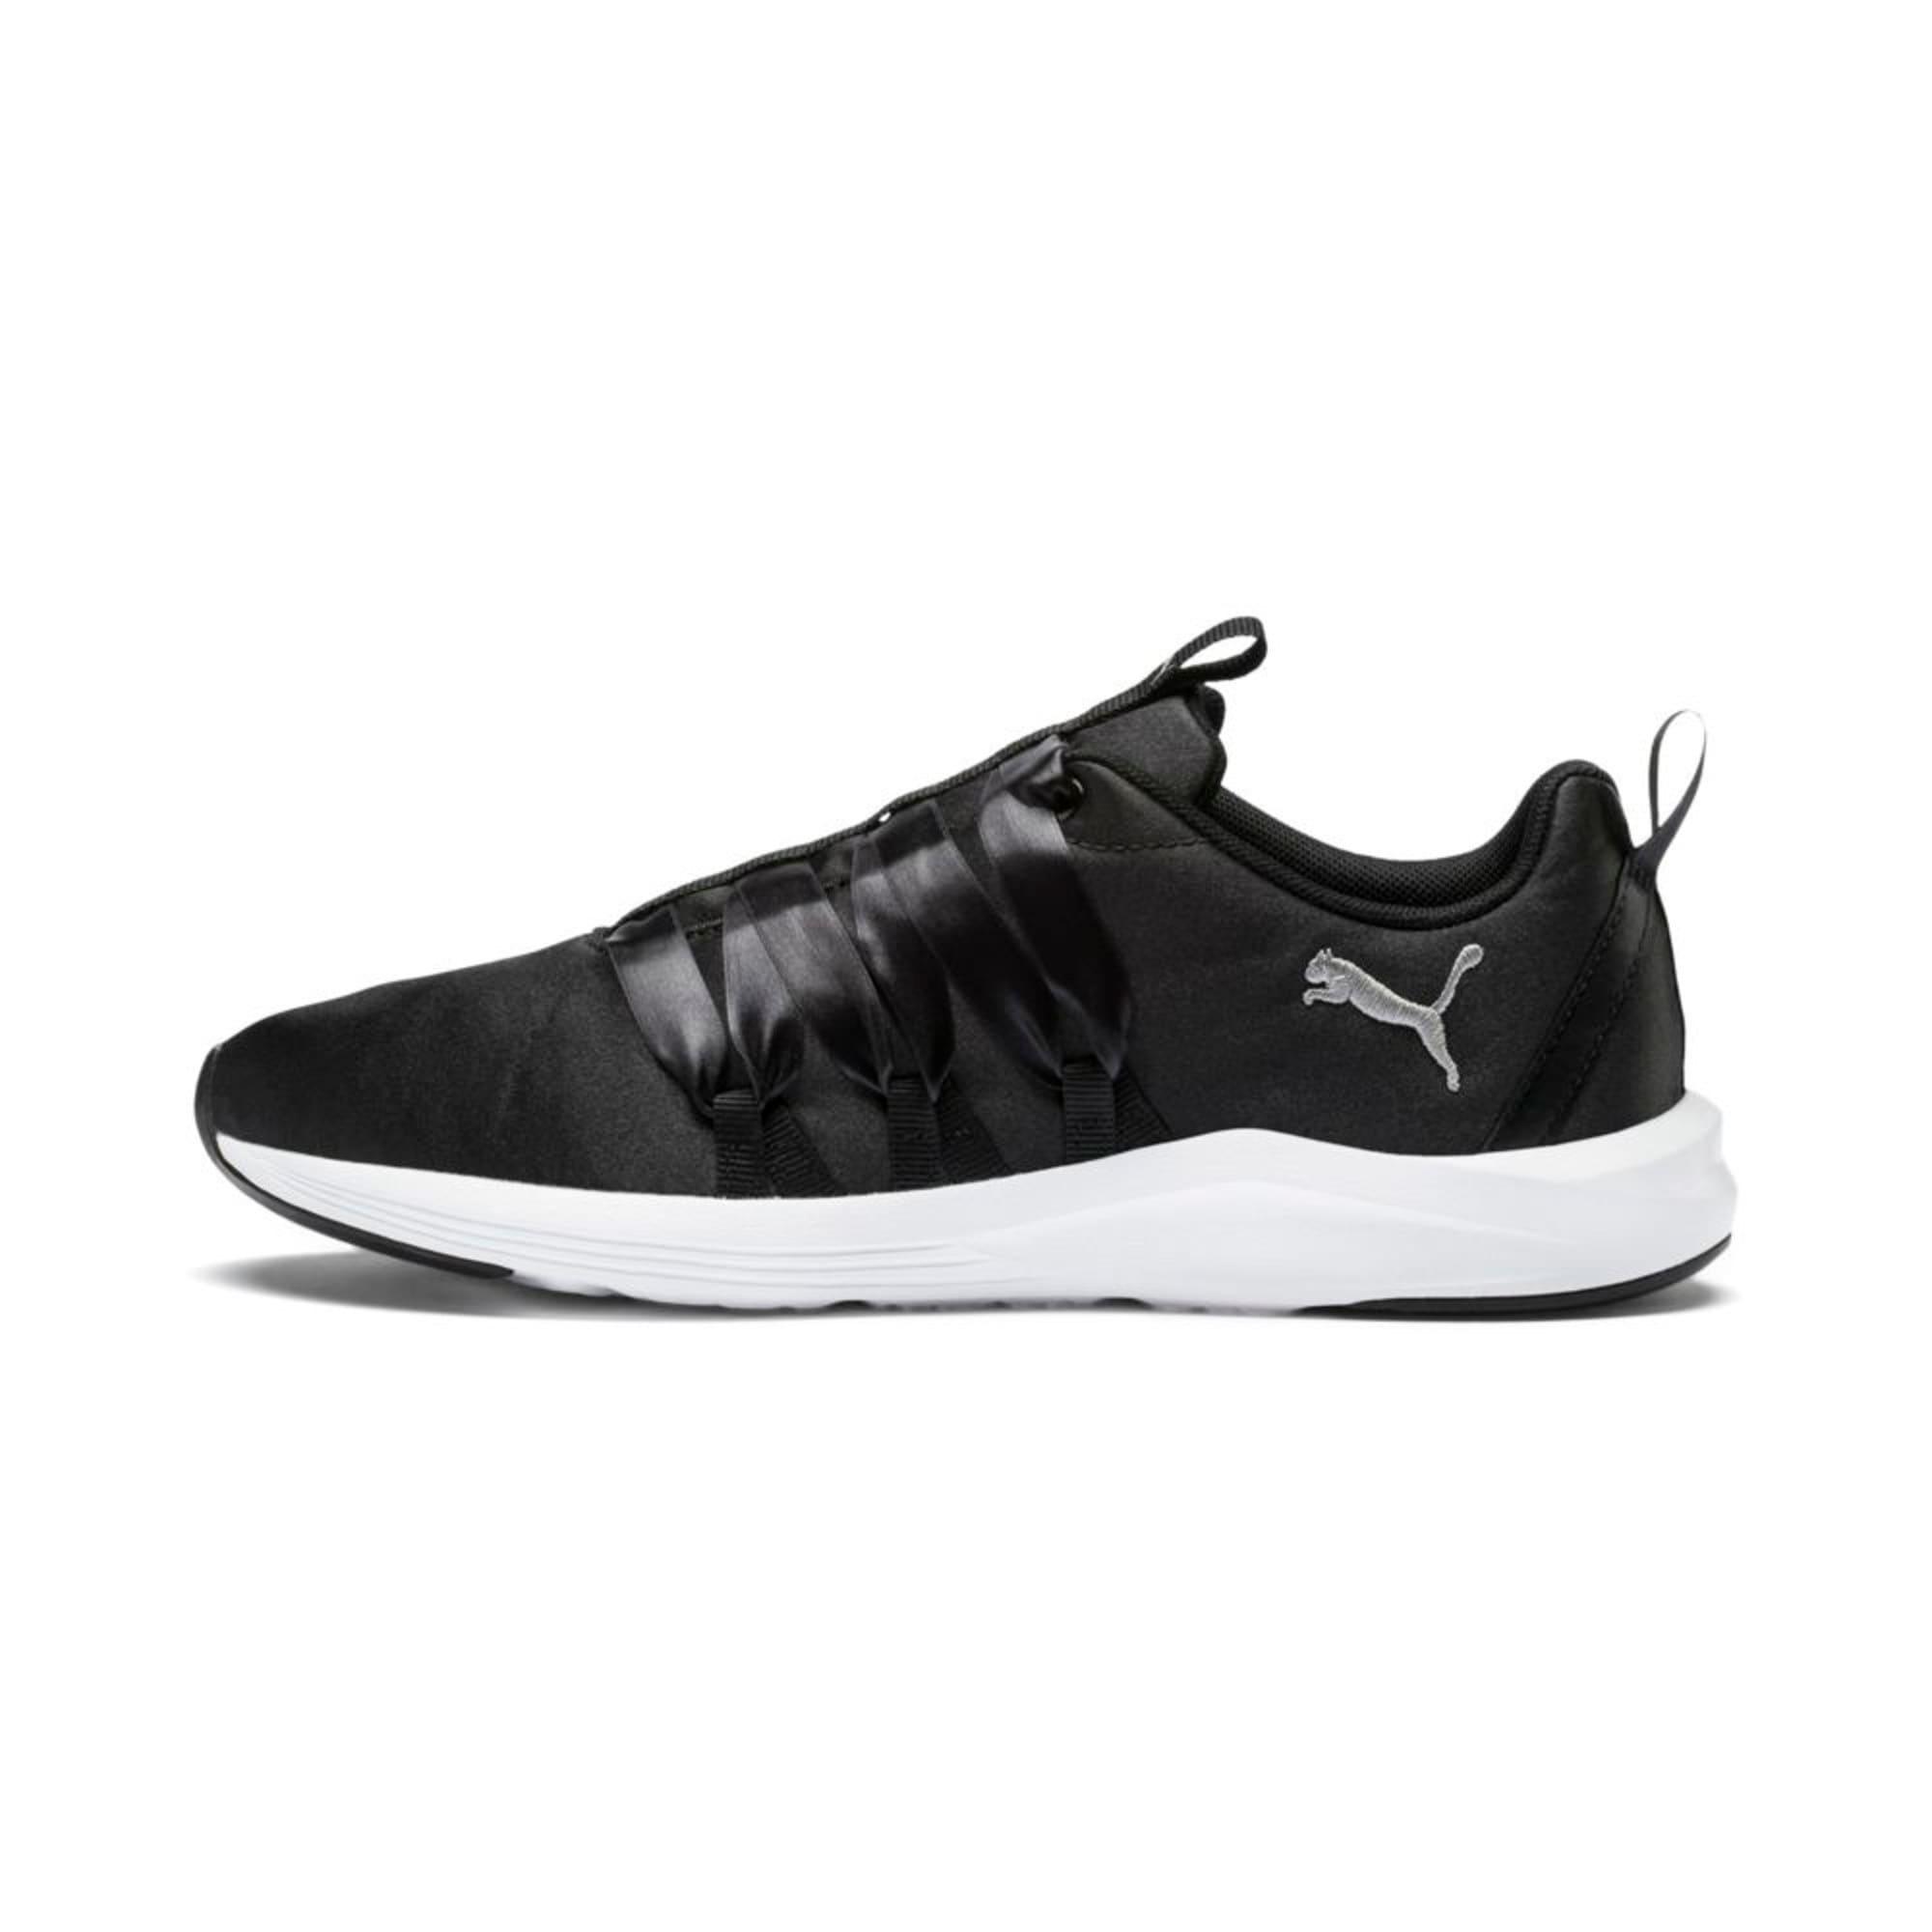 Thumbnail 1 of Prowl Alt Satin Women's Training Shoes, Puma Black-Puma White, medium-IND